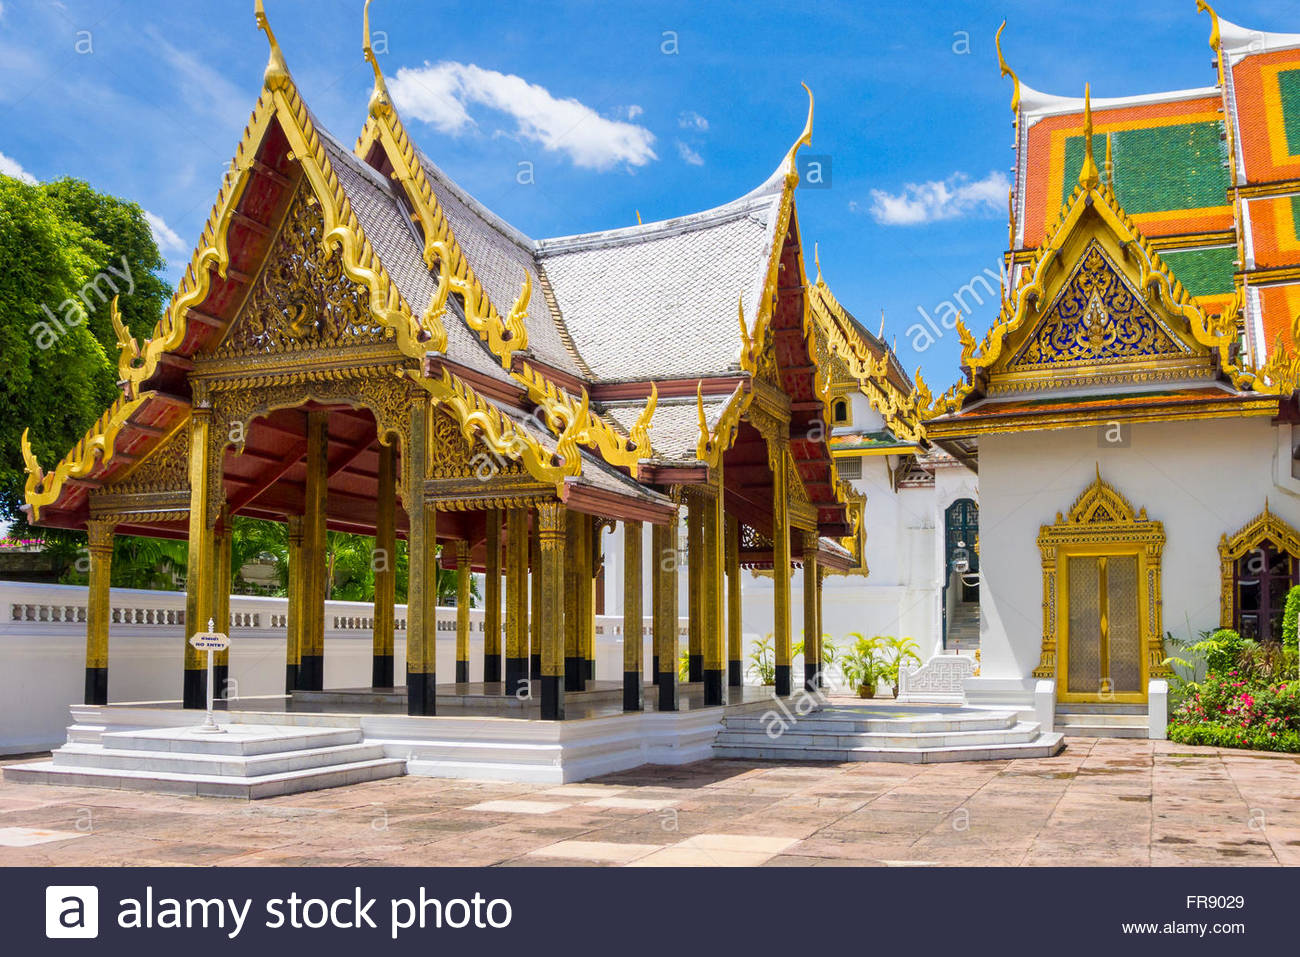 Phra Thinang Racharuedee pavilion and Phra Thinang Amarin Winitchai throne hall, Grand Palace complex, Bangkok, - Stock Image